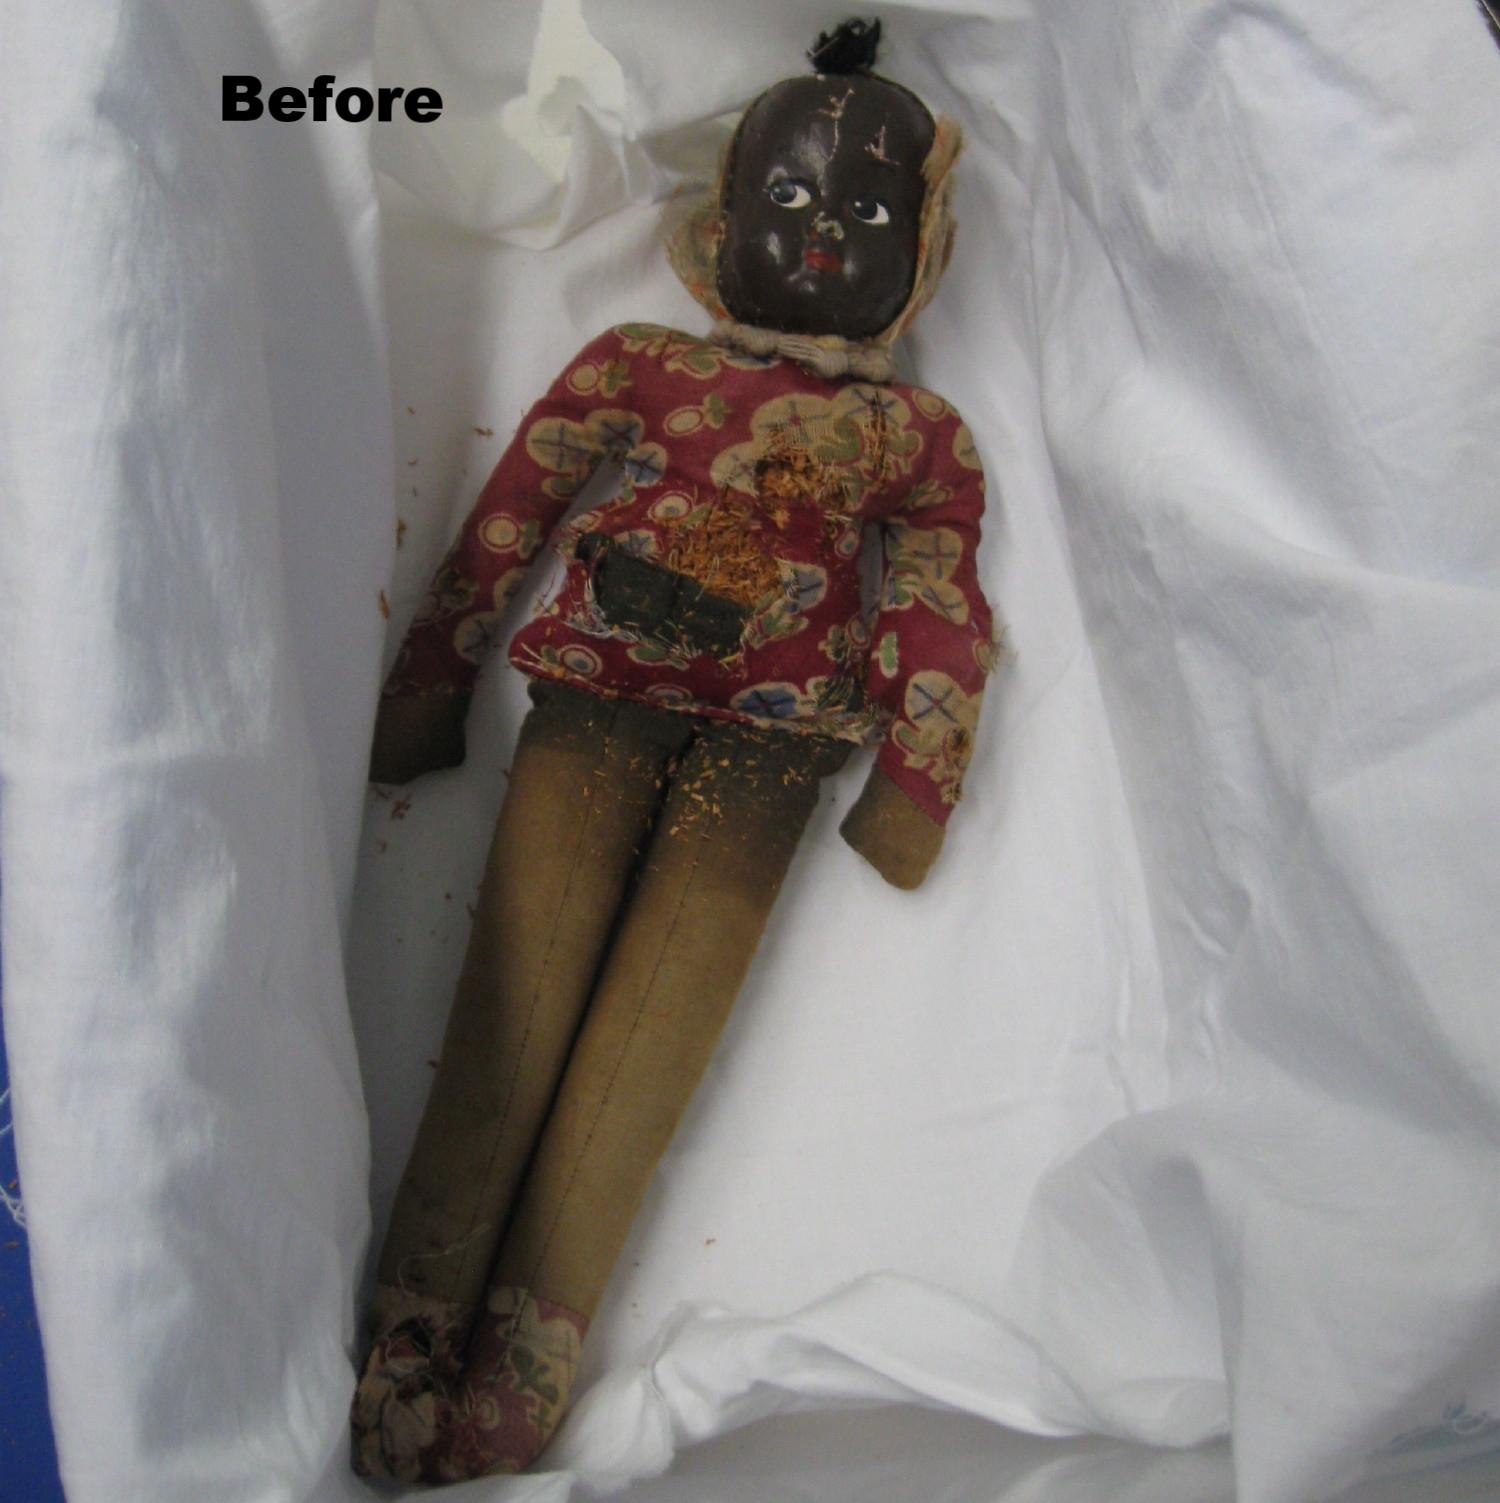 mammy-doll-before.jpg